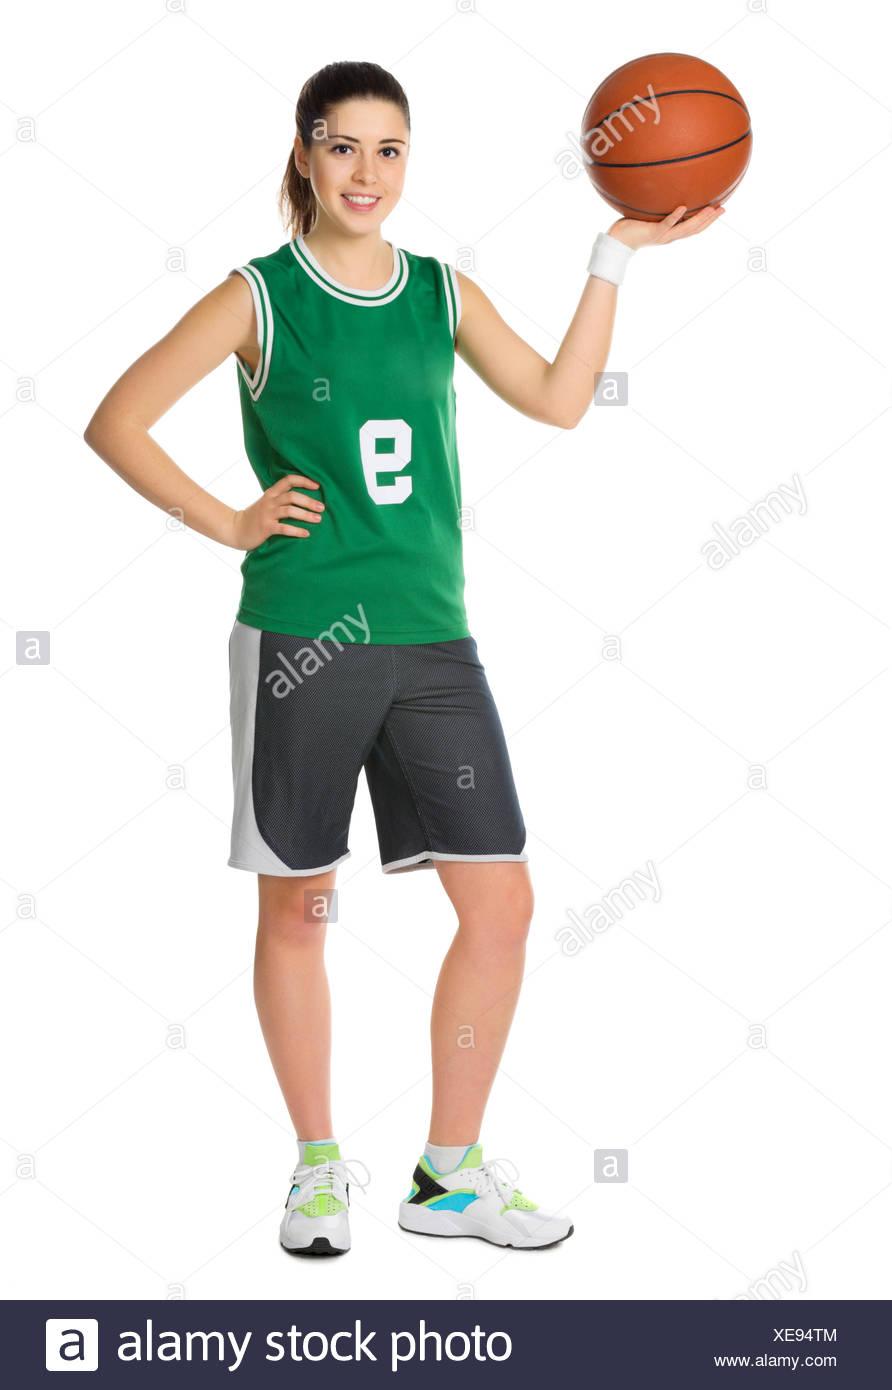 Fantastisch Mädchen Basketball Coaching Lebenslauf Ideen - Bilder ...